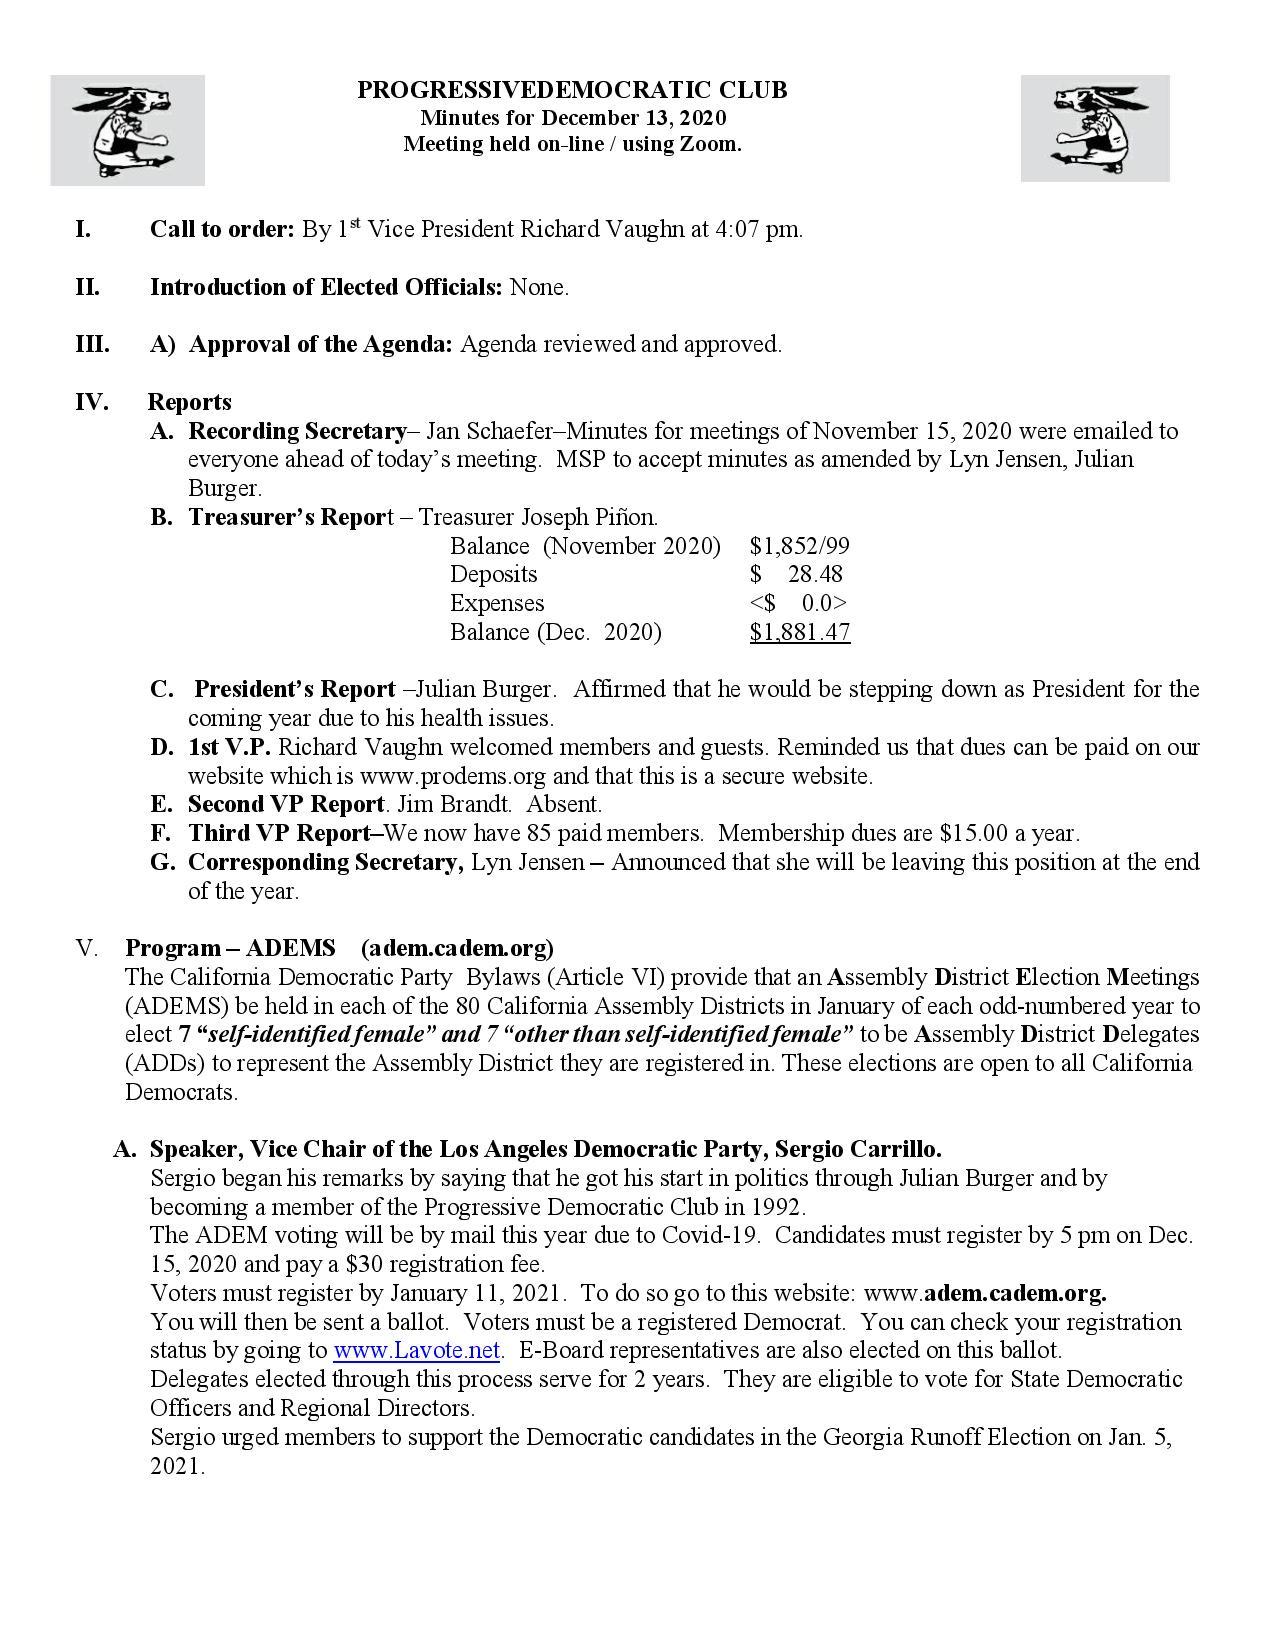 Minutes_December13_2020-page-001.jpg